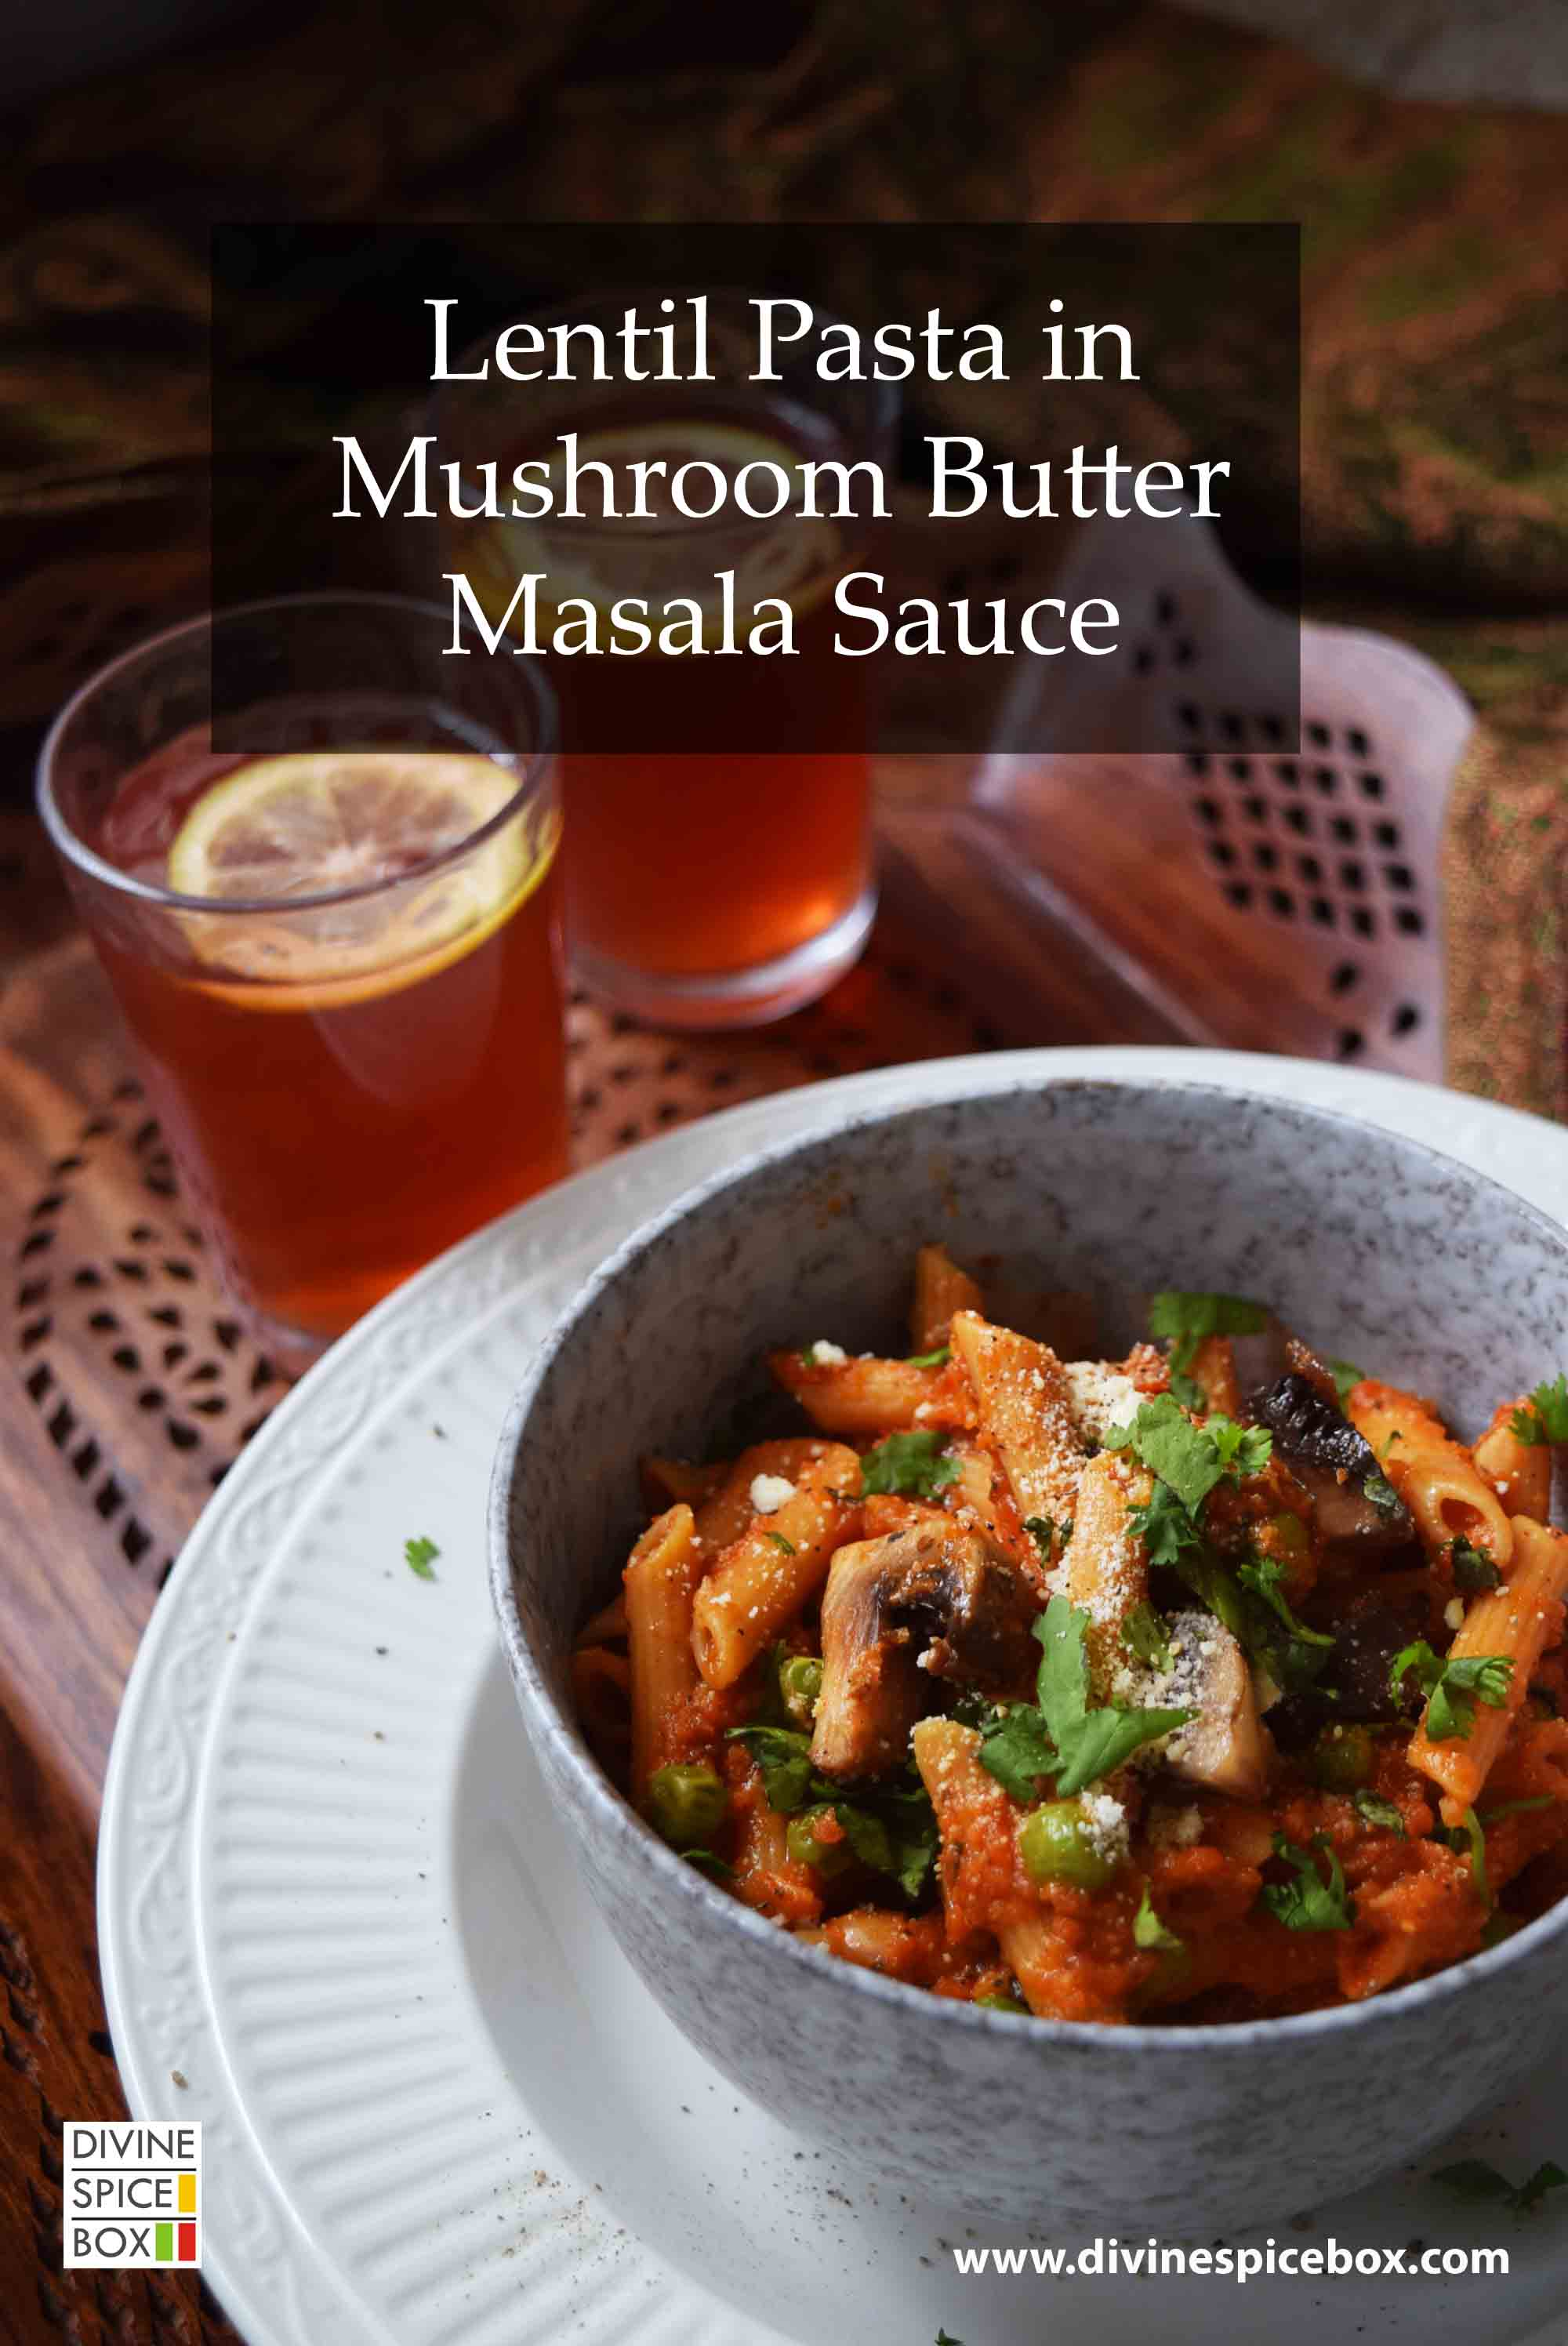 Lentil Pasta in Mushroom Butter Masala Sauce